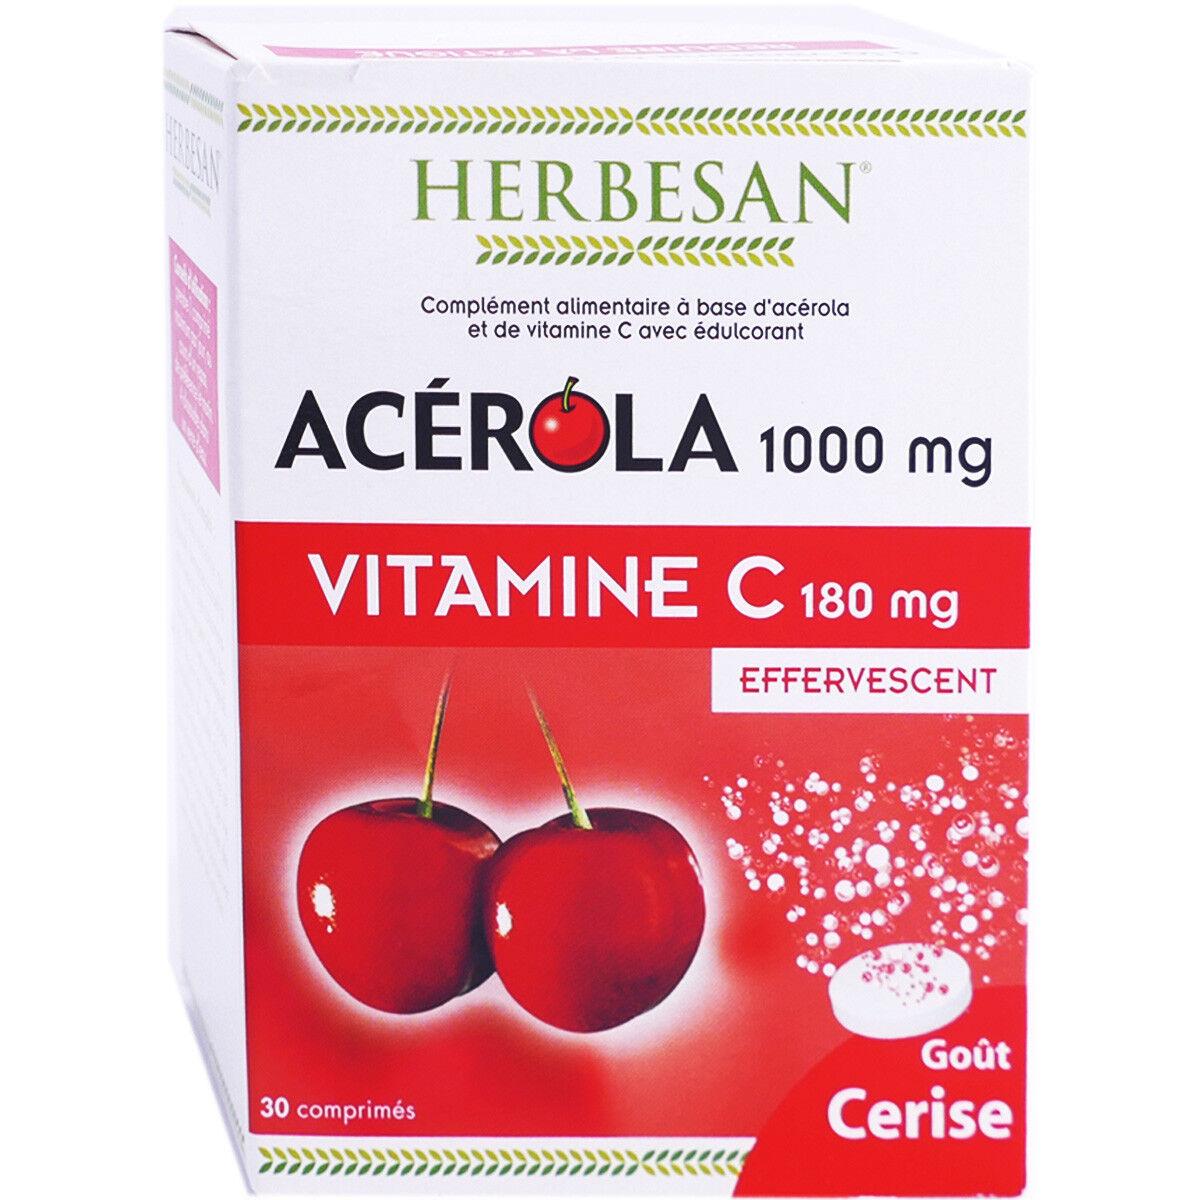 Herbesan acerola 1000 vitamine c 180mg effervescents